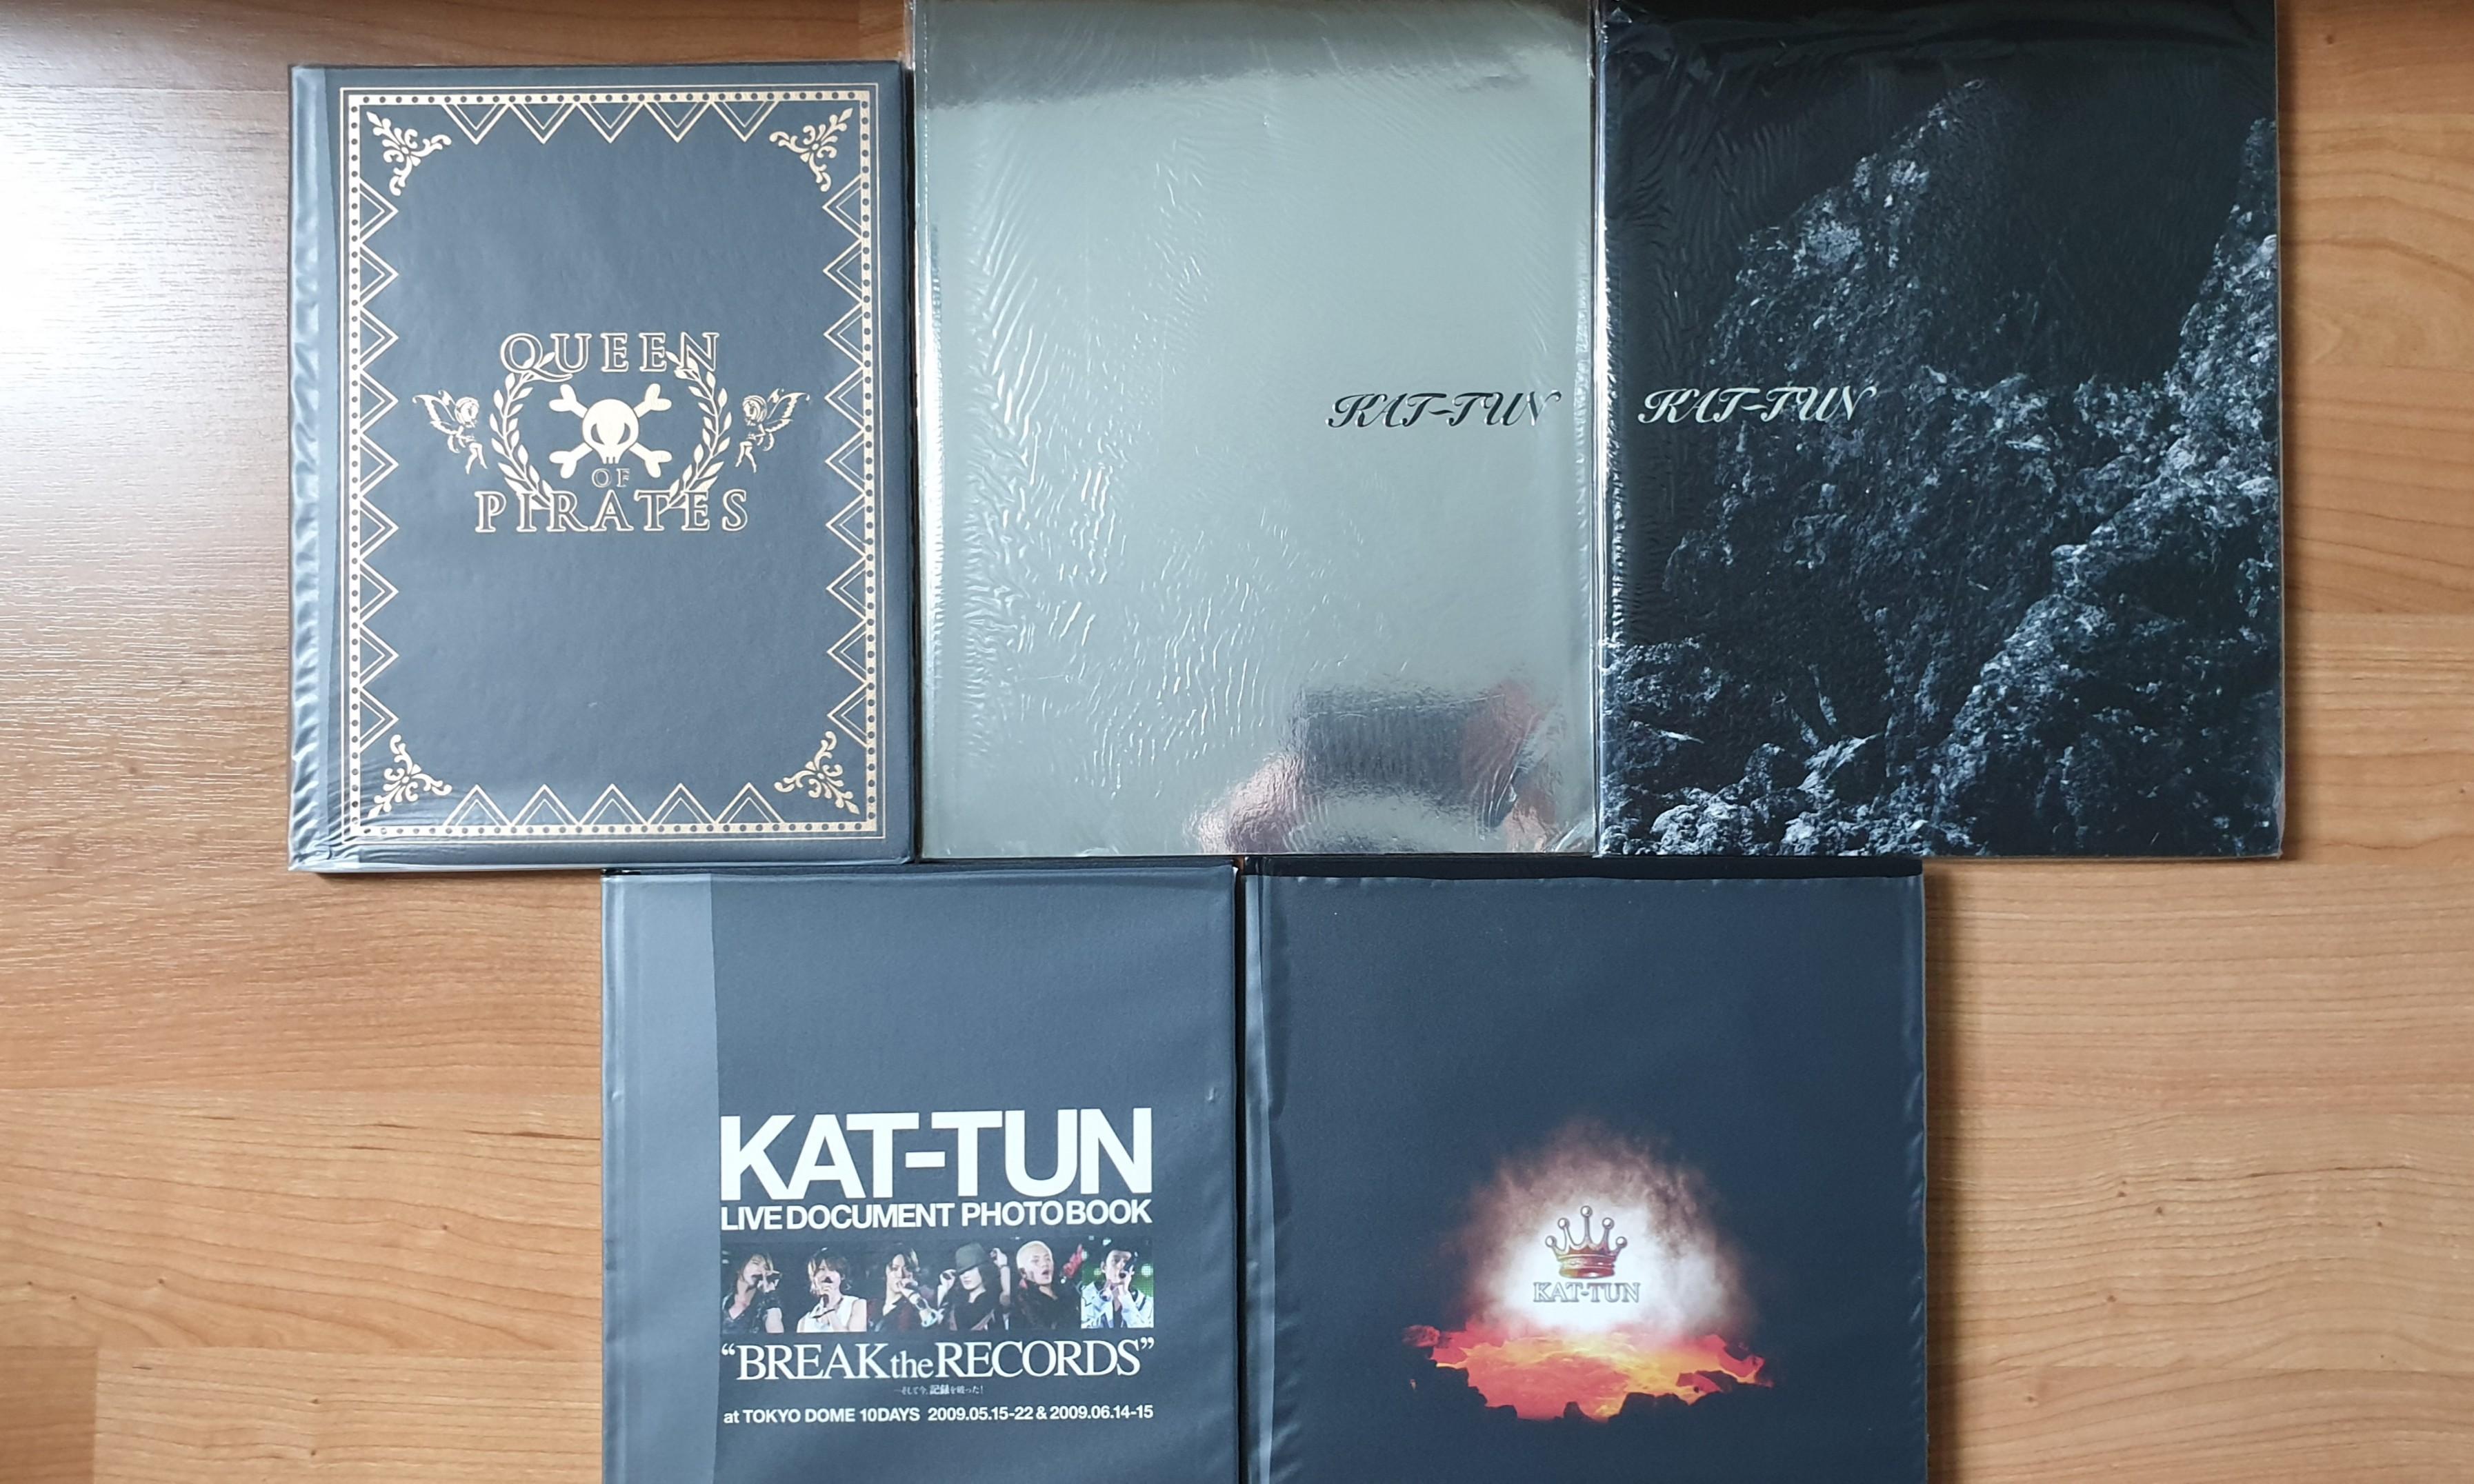 KAT-TUN PAMPHLET YEAR 2003 - 2016 (ALL ORIGINAL FROM JAPAN)